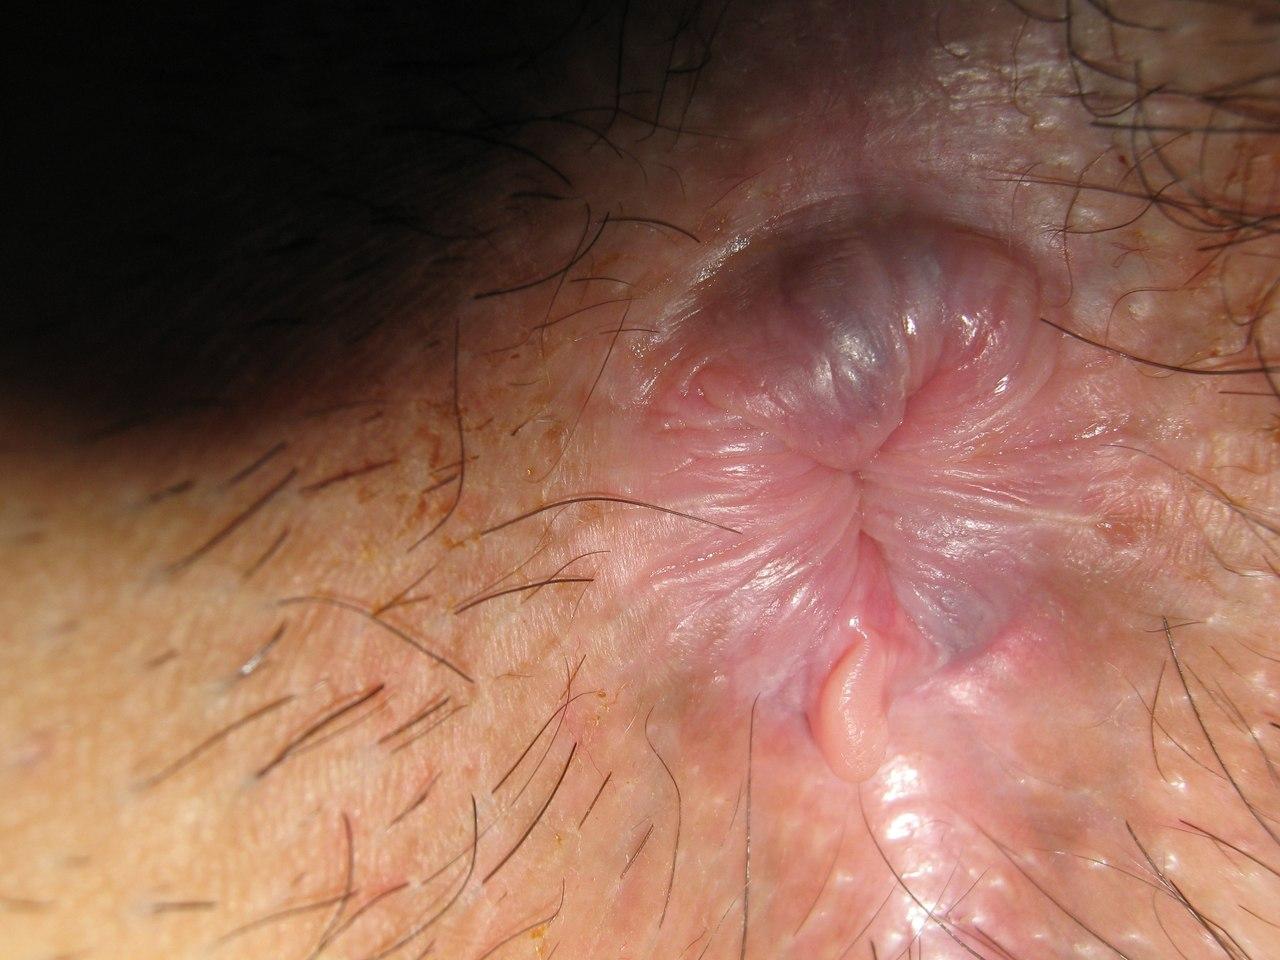 borodavki-vozle-anusa